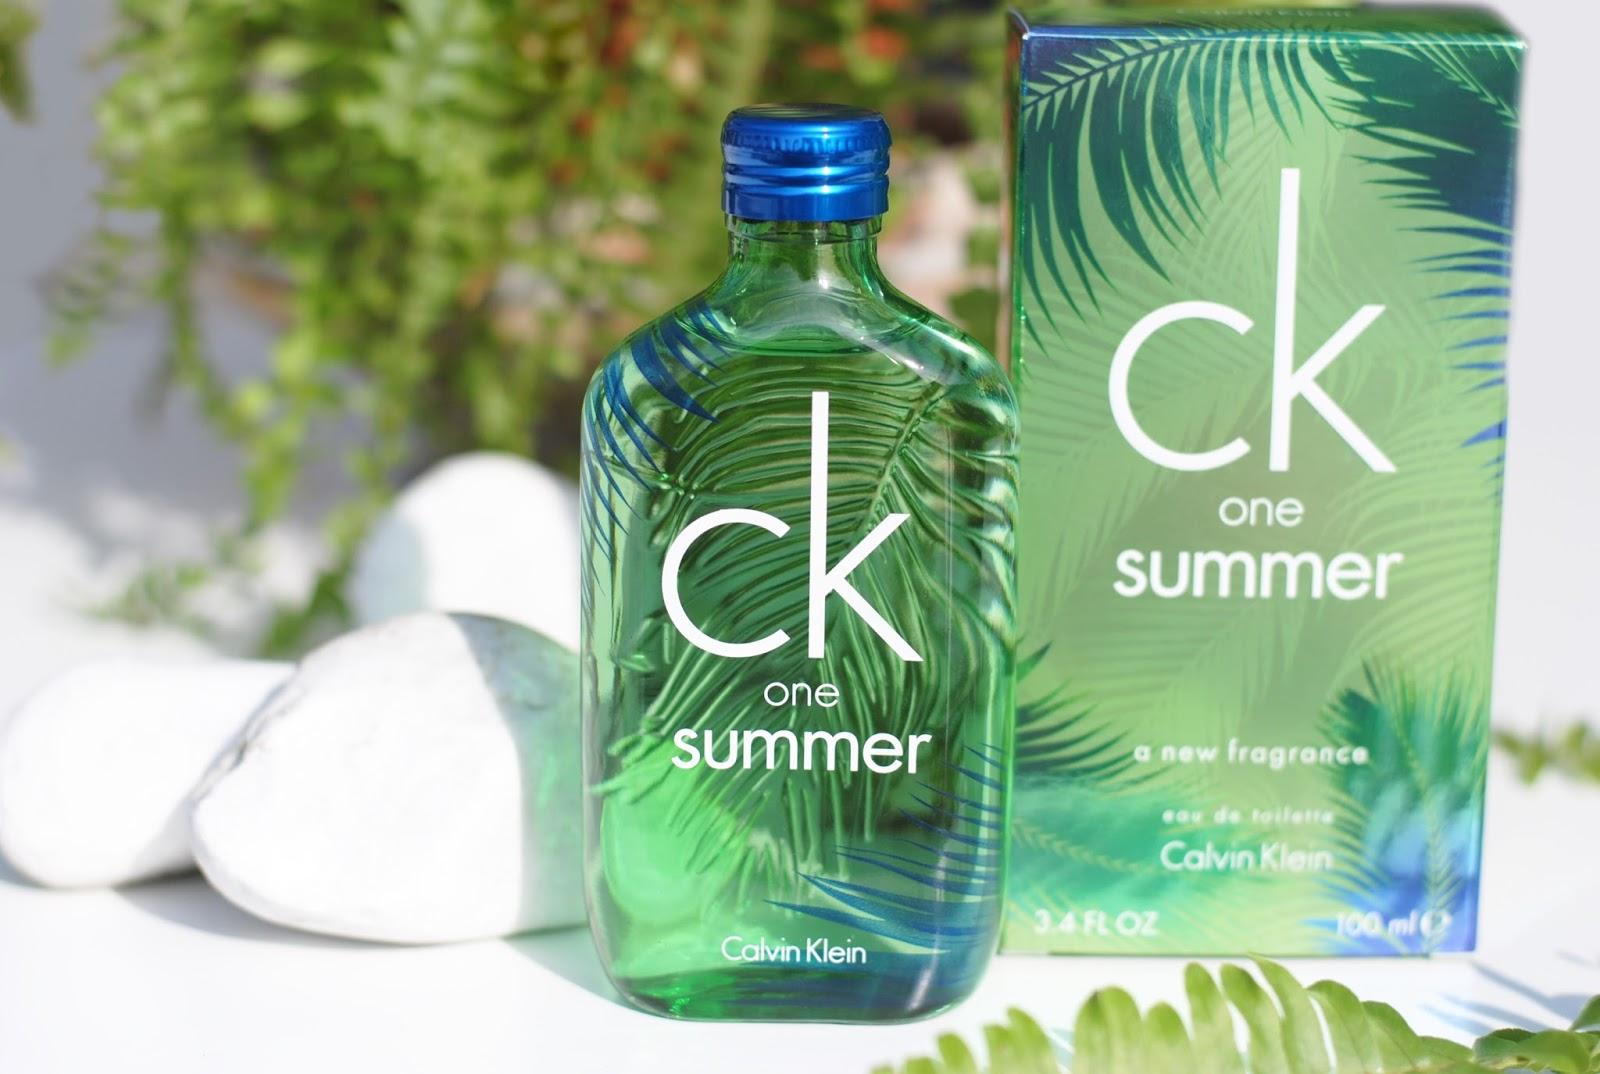 Vignette ck one summer 2016